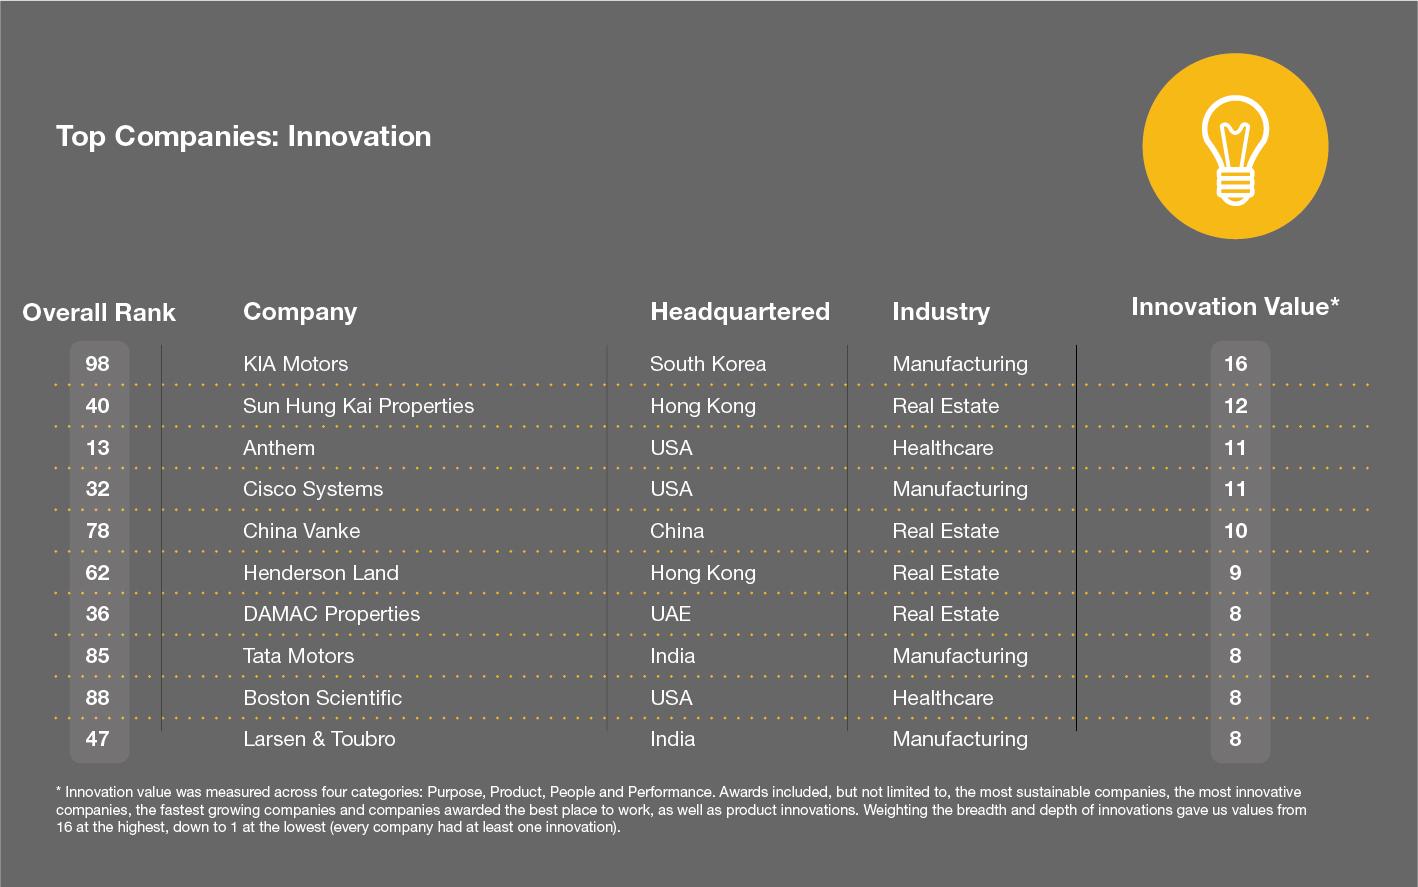 Crowe Art of Smart 2019 Risk Equation Top Companies